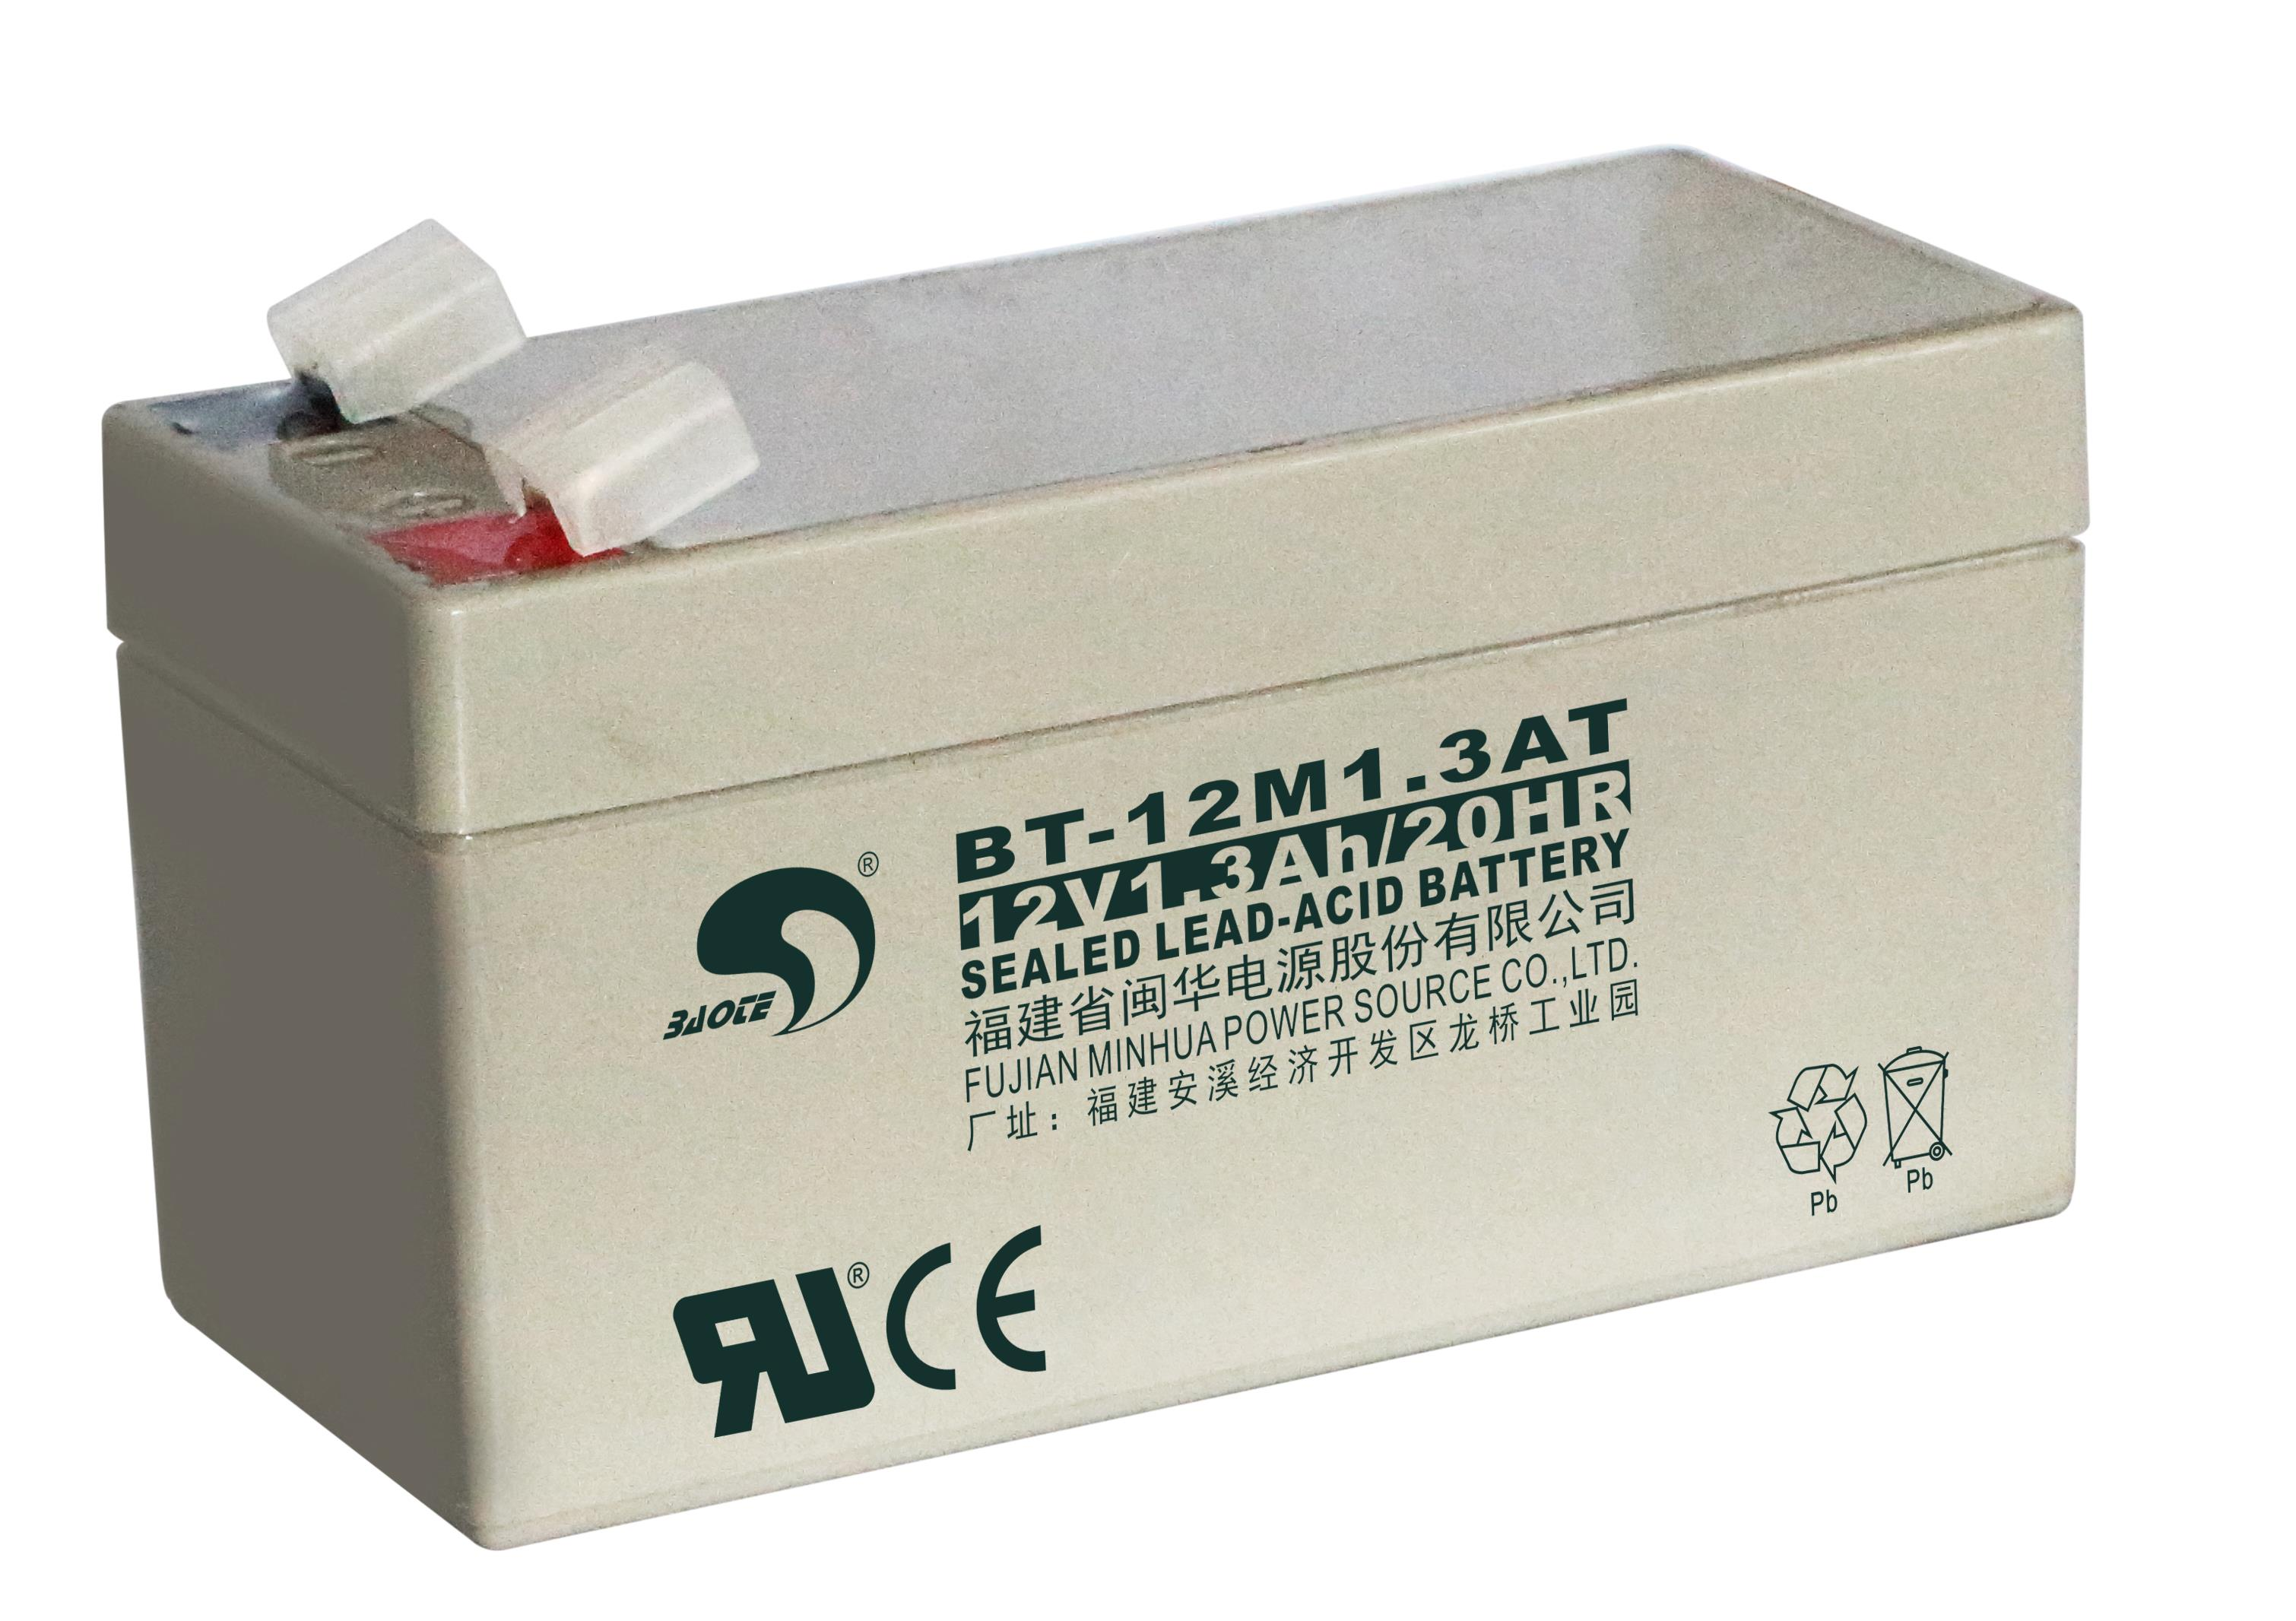 赛特BT-12M1.3AT(12V1.3Ah/20HR)免维护铅酸蓄电池 收银机电瓶